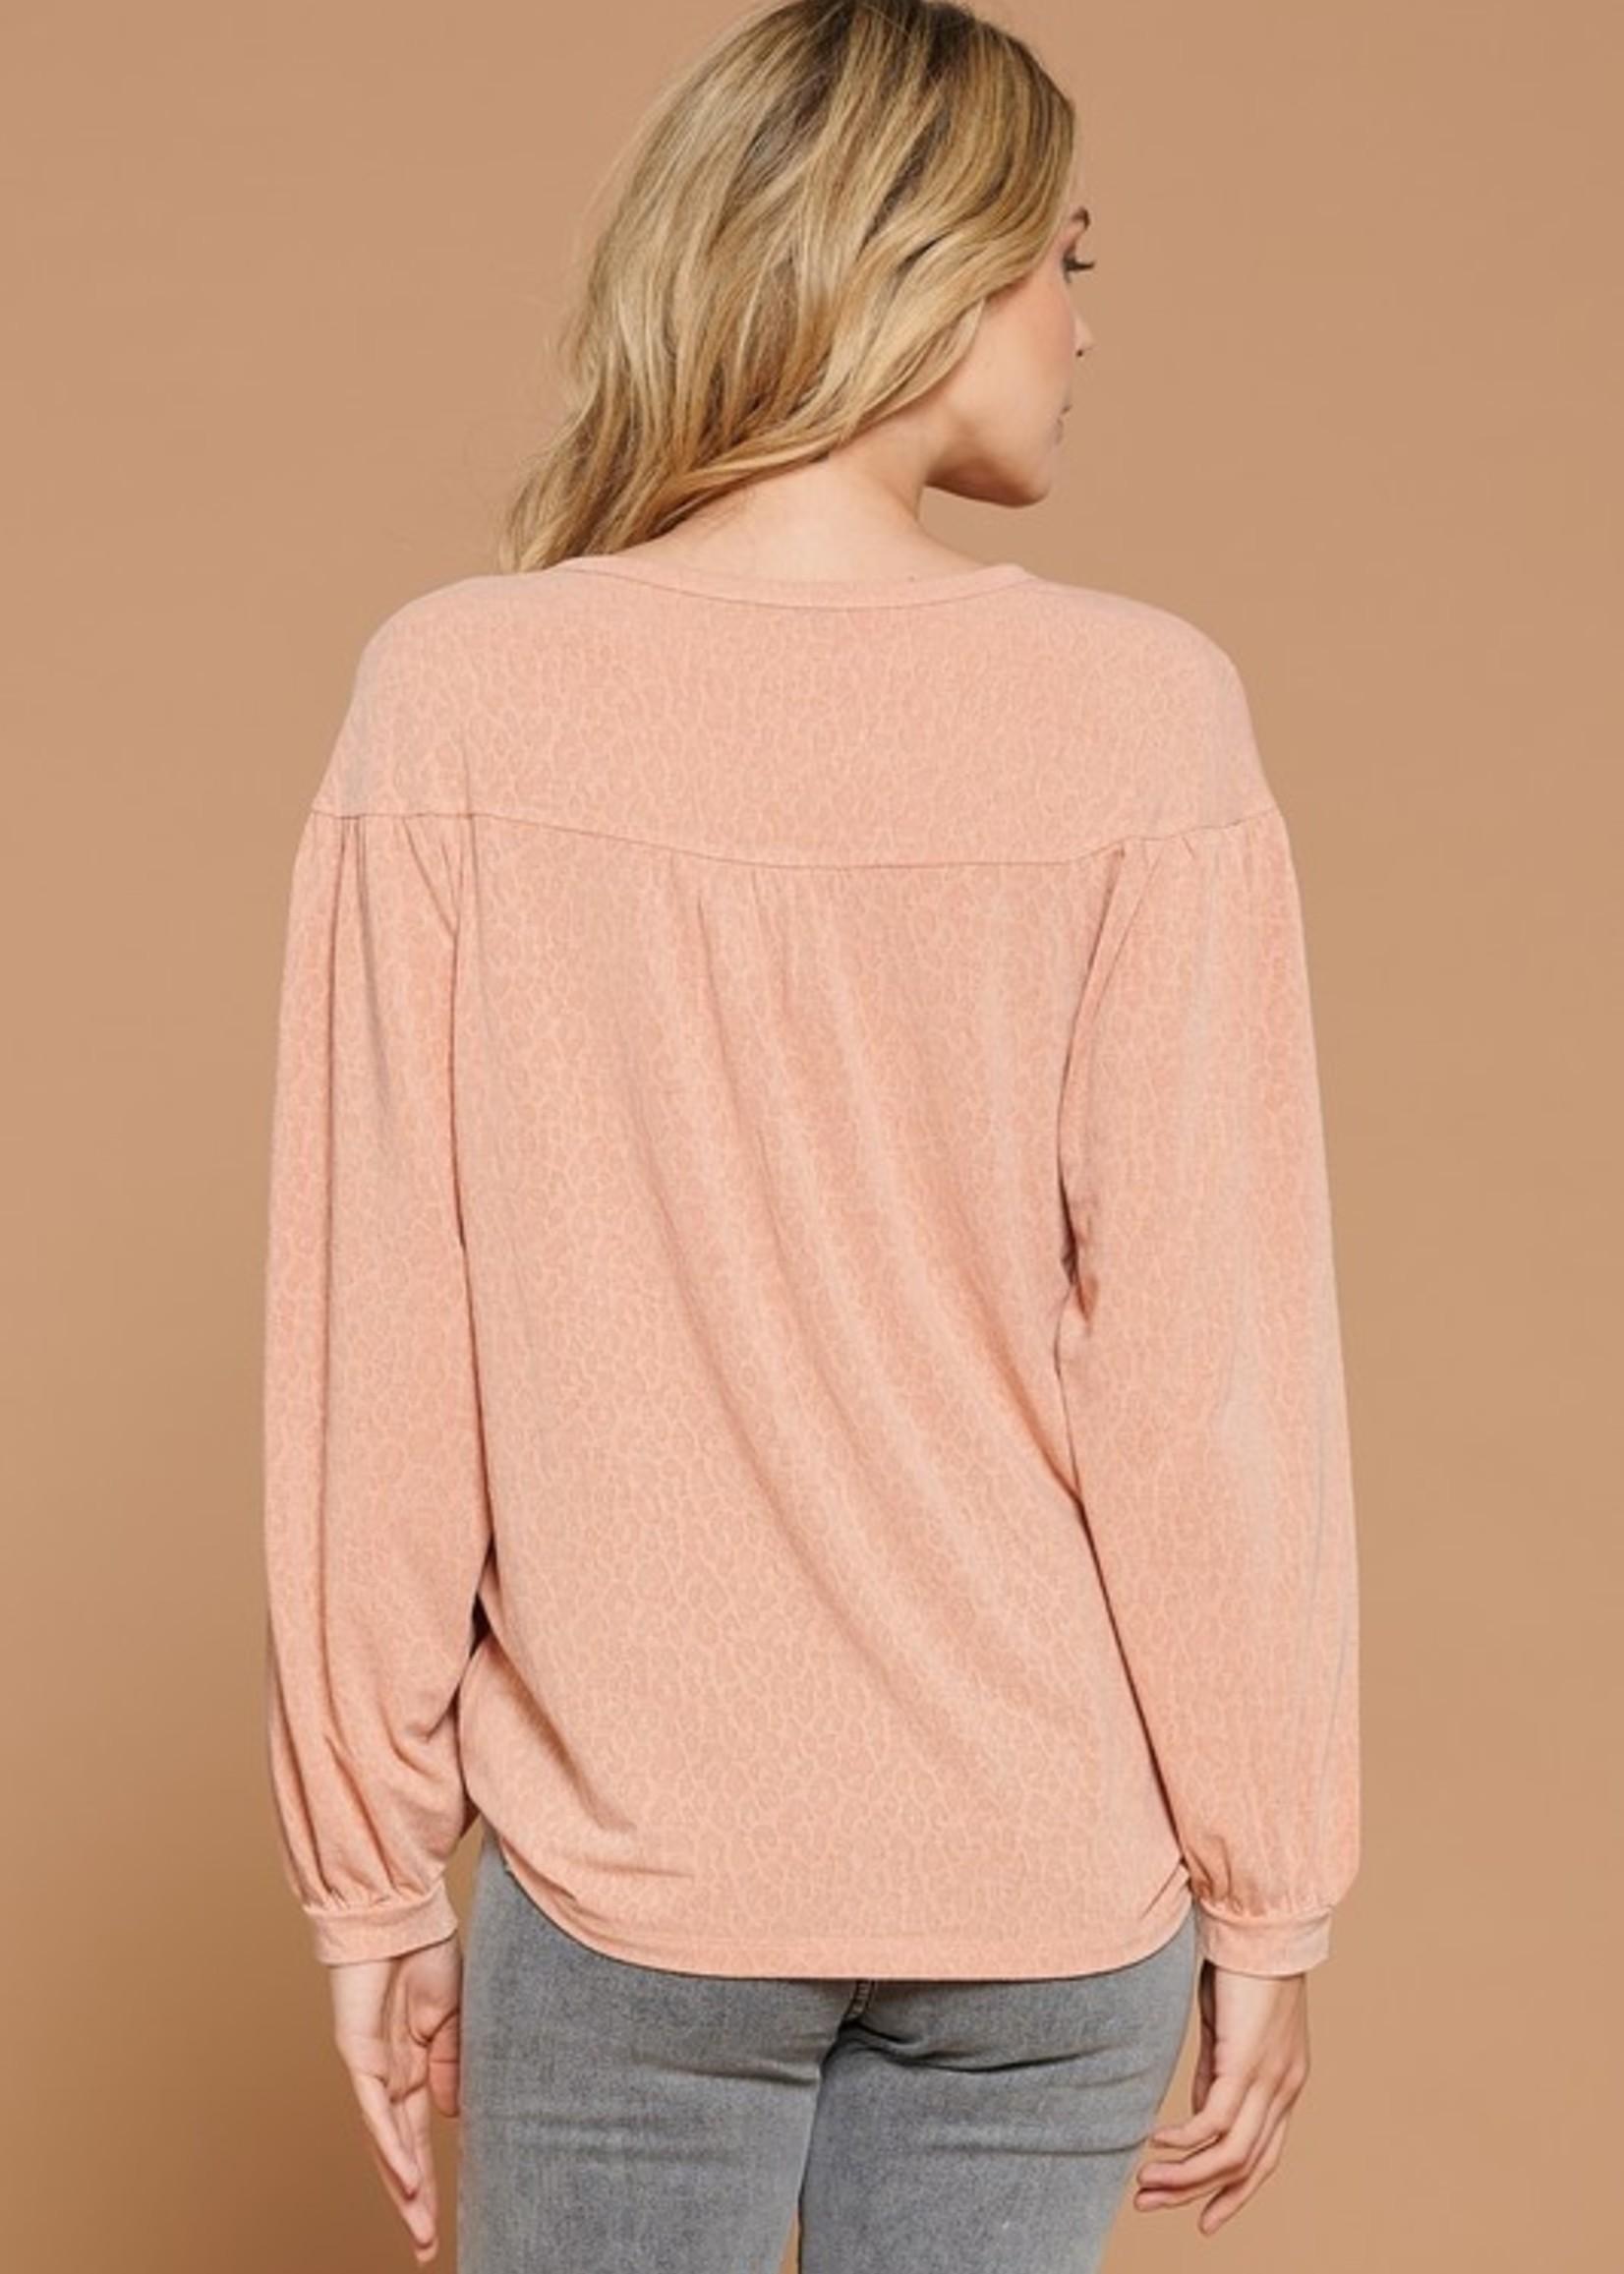 Long Sleeve Leopard Tee - Pink